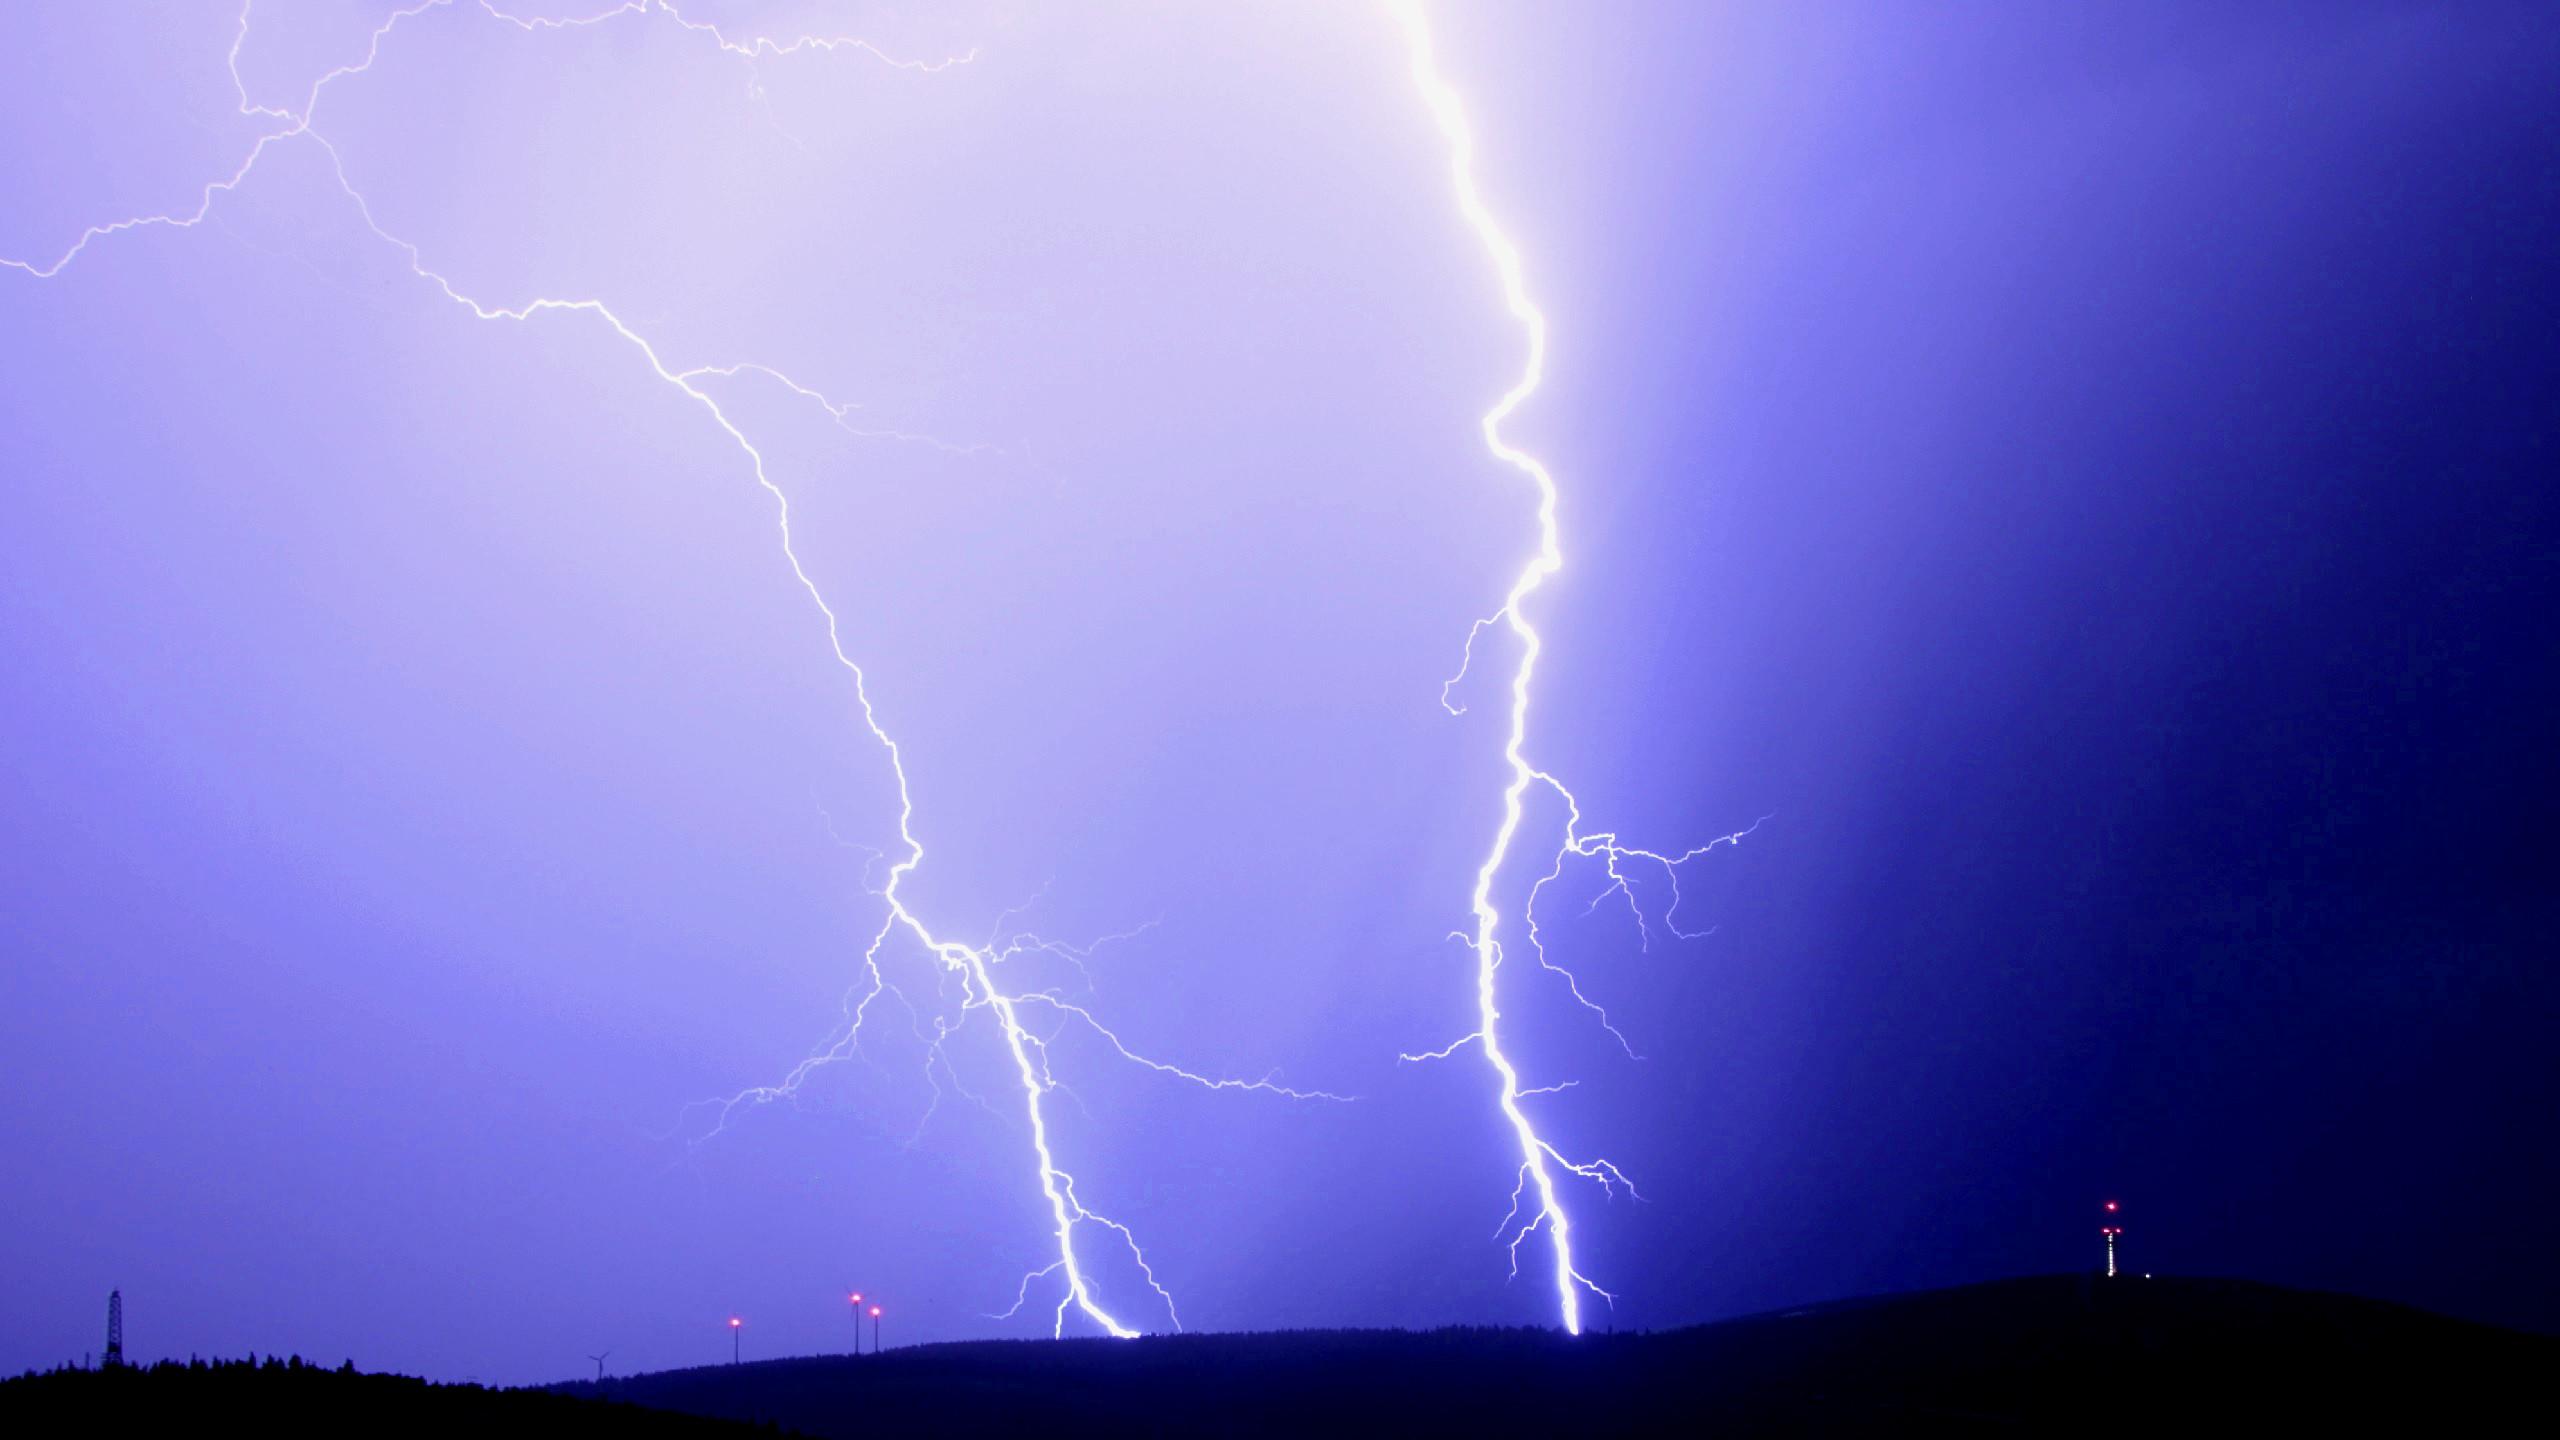 Res: 2560x1440, Thunder wallpaper with lightning strikes